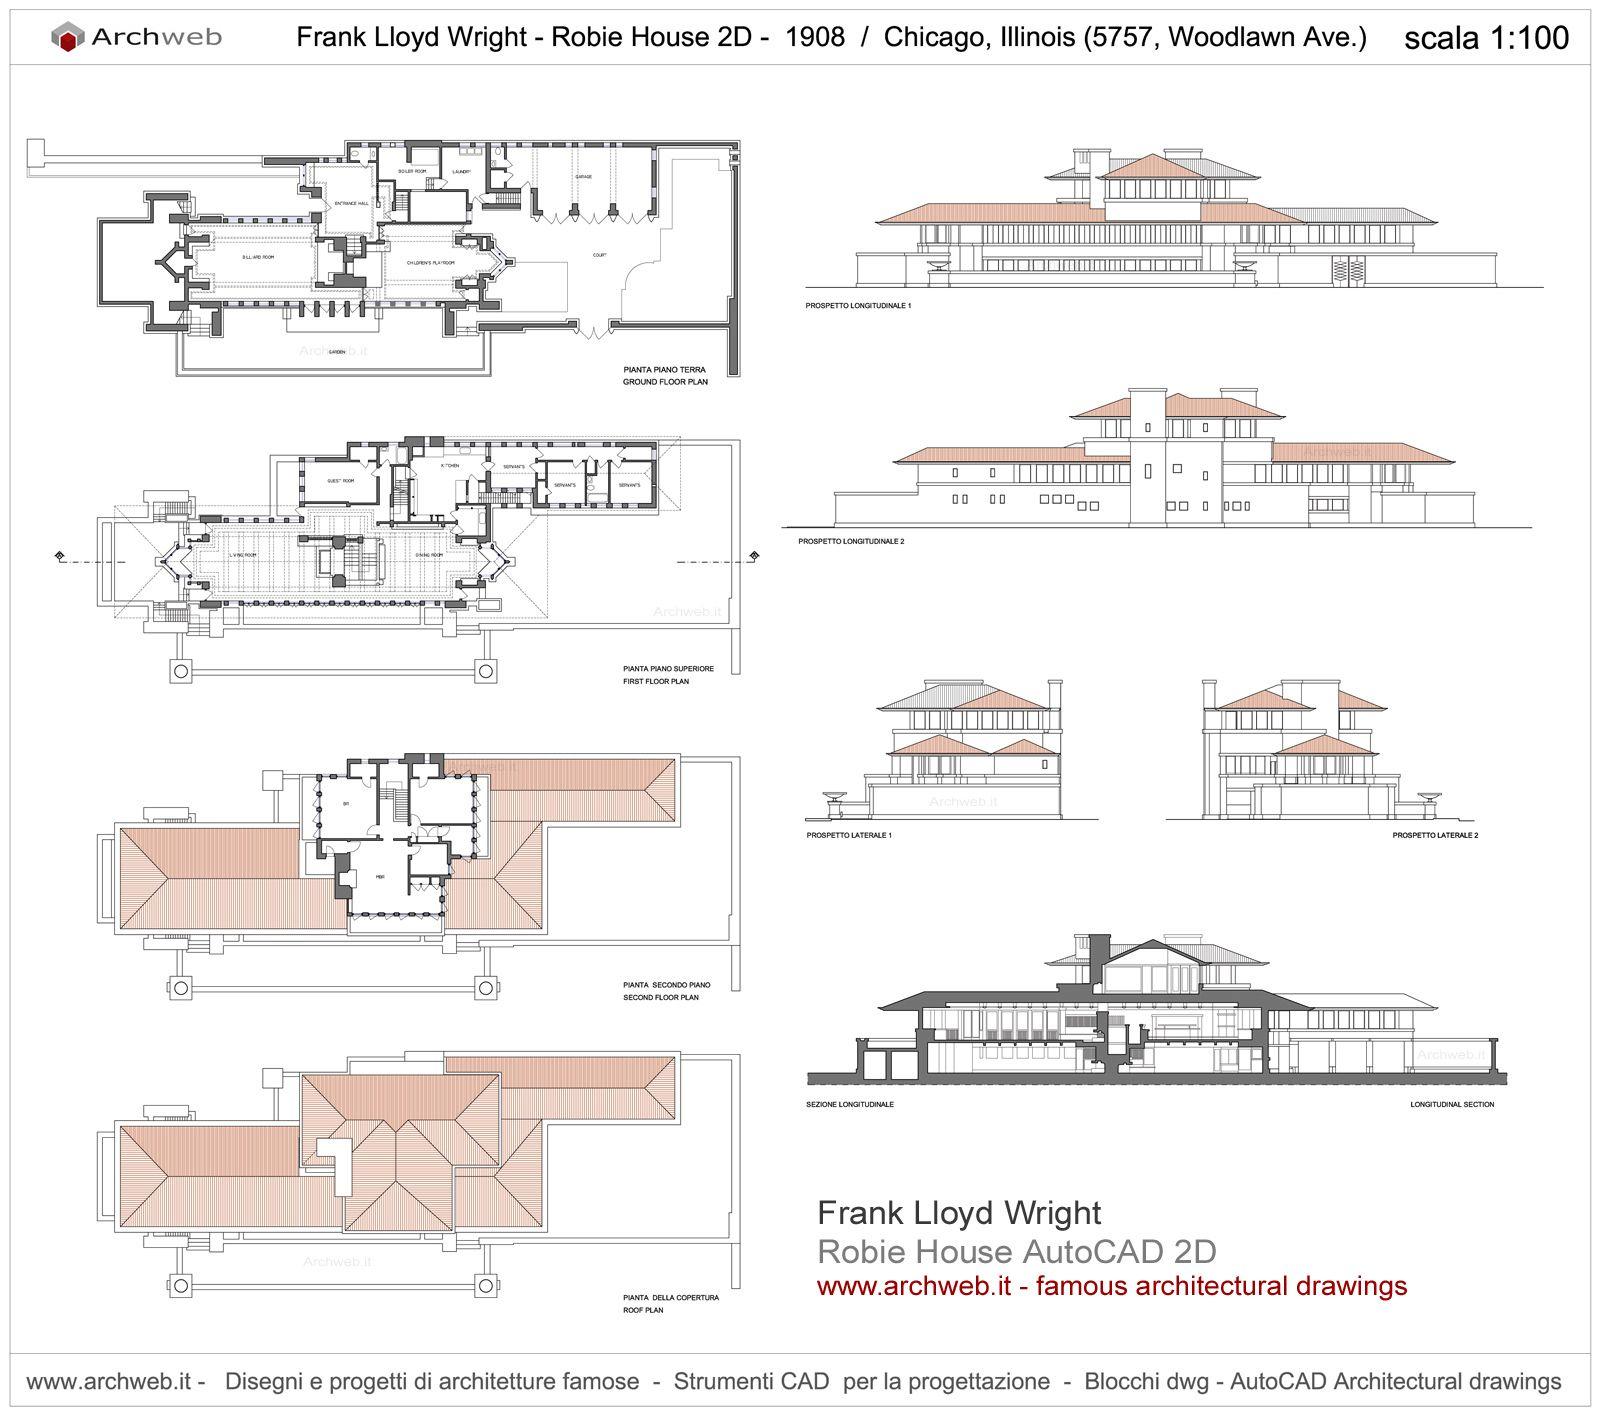 Robie House Chicago IL 1908  Frank Lloyd Wright  Archweb 2D  archi  Frank Lloyd Wright  Frank lloyd wright homes House blueprints e